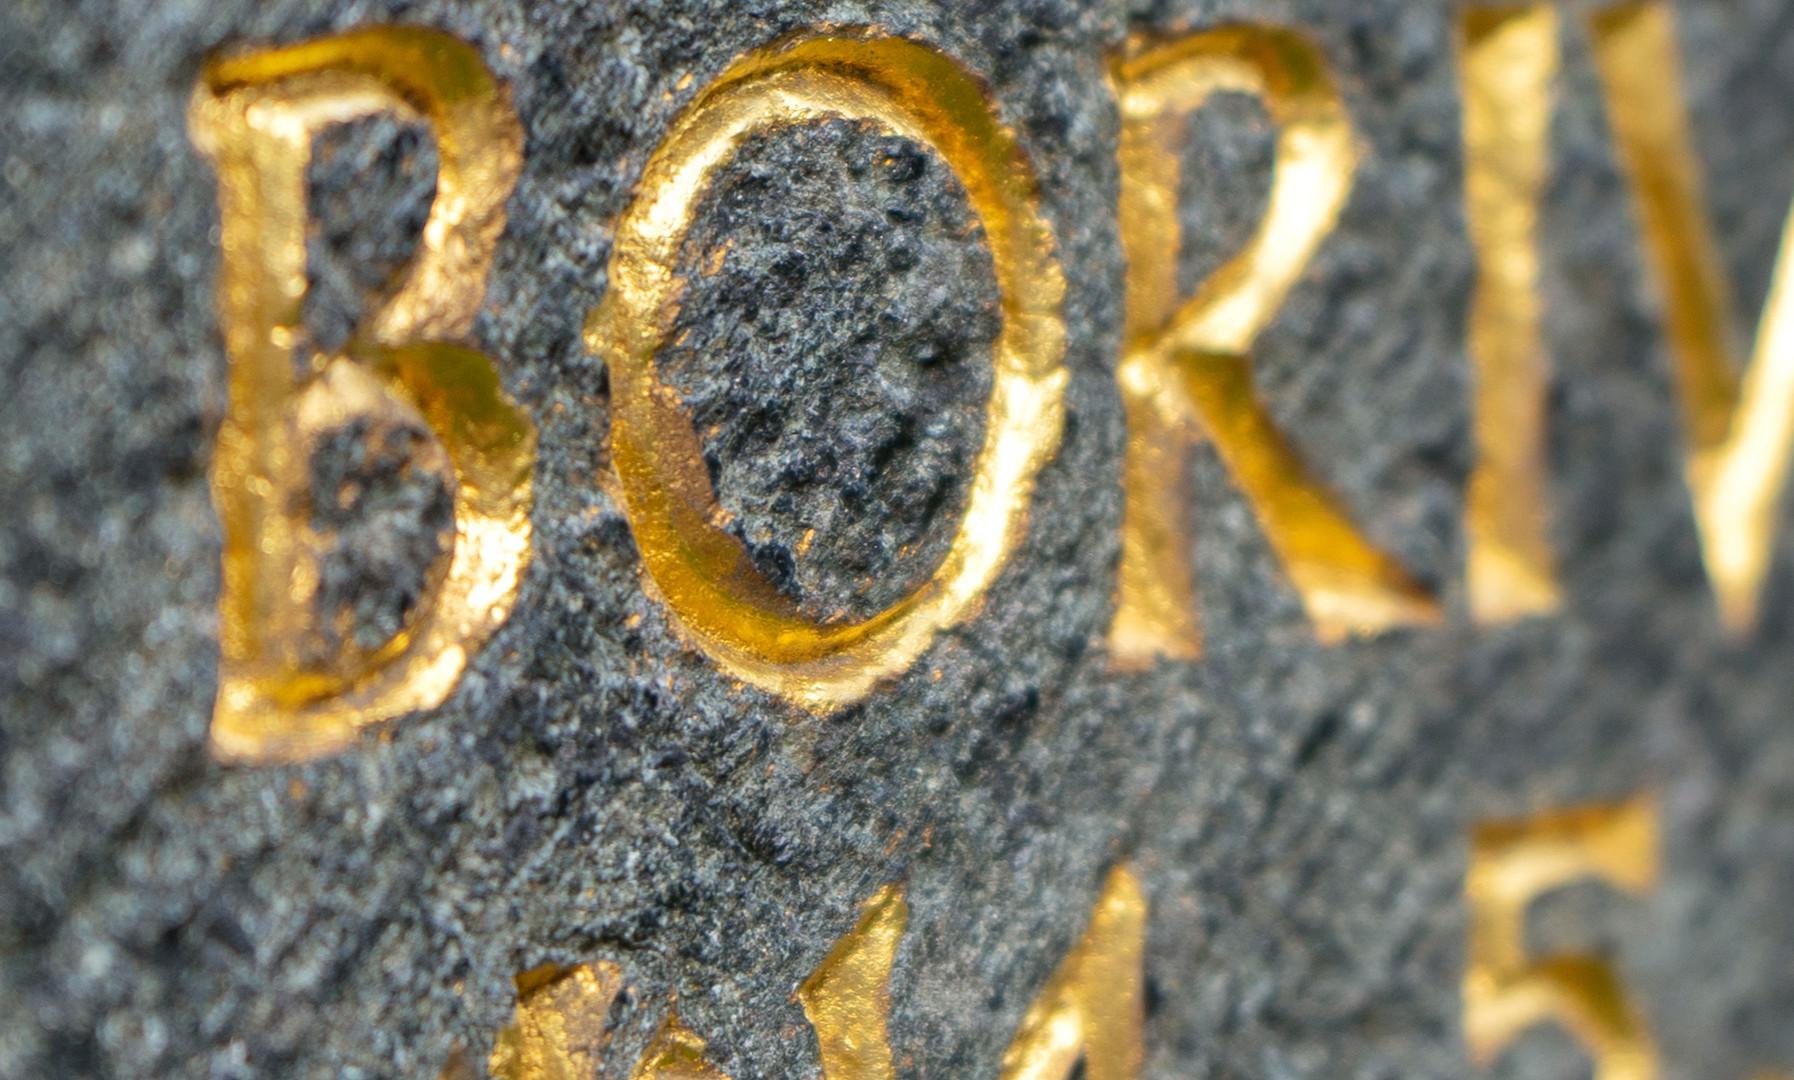 Grabmal-Grabstein-Inschrift-vergoldet-St